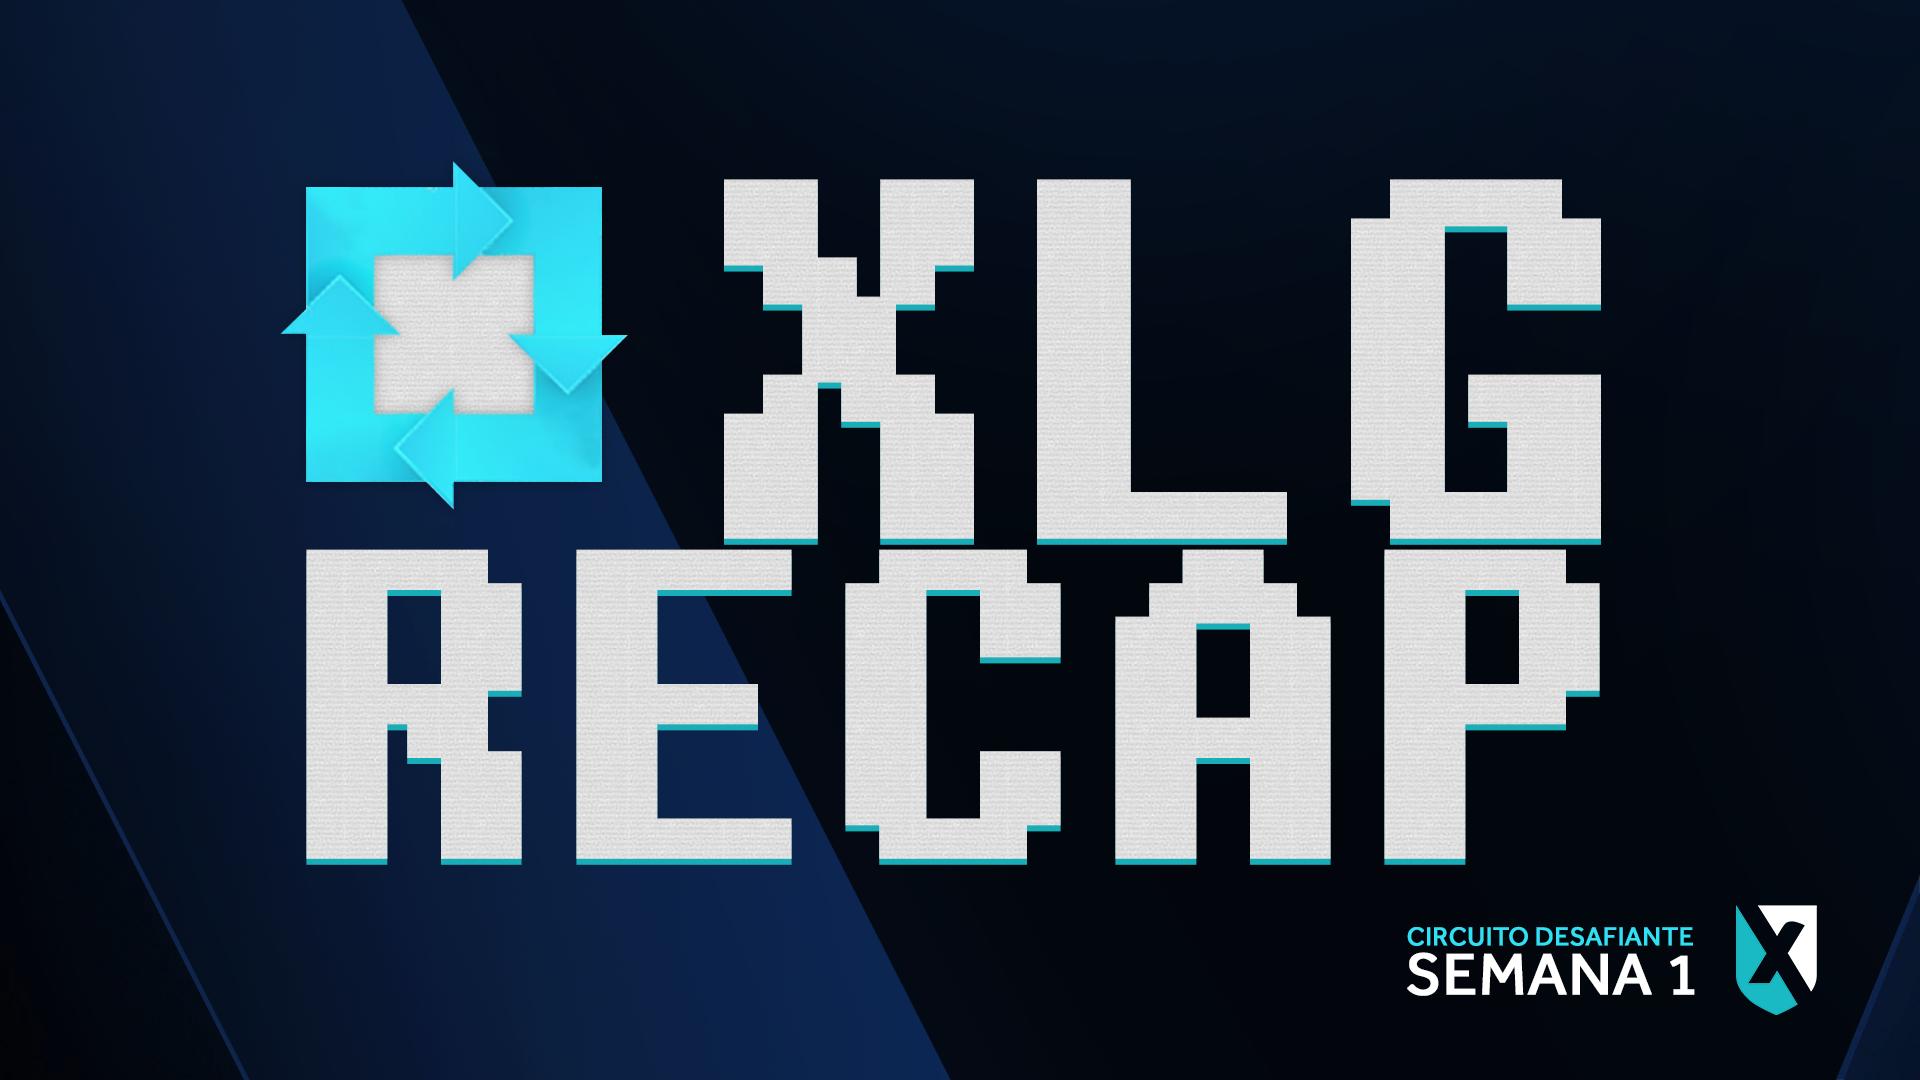 XLG Recap - Semana 1 - Desafiante 2016